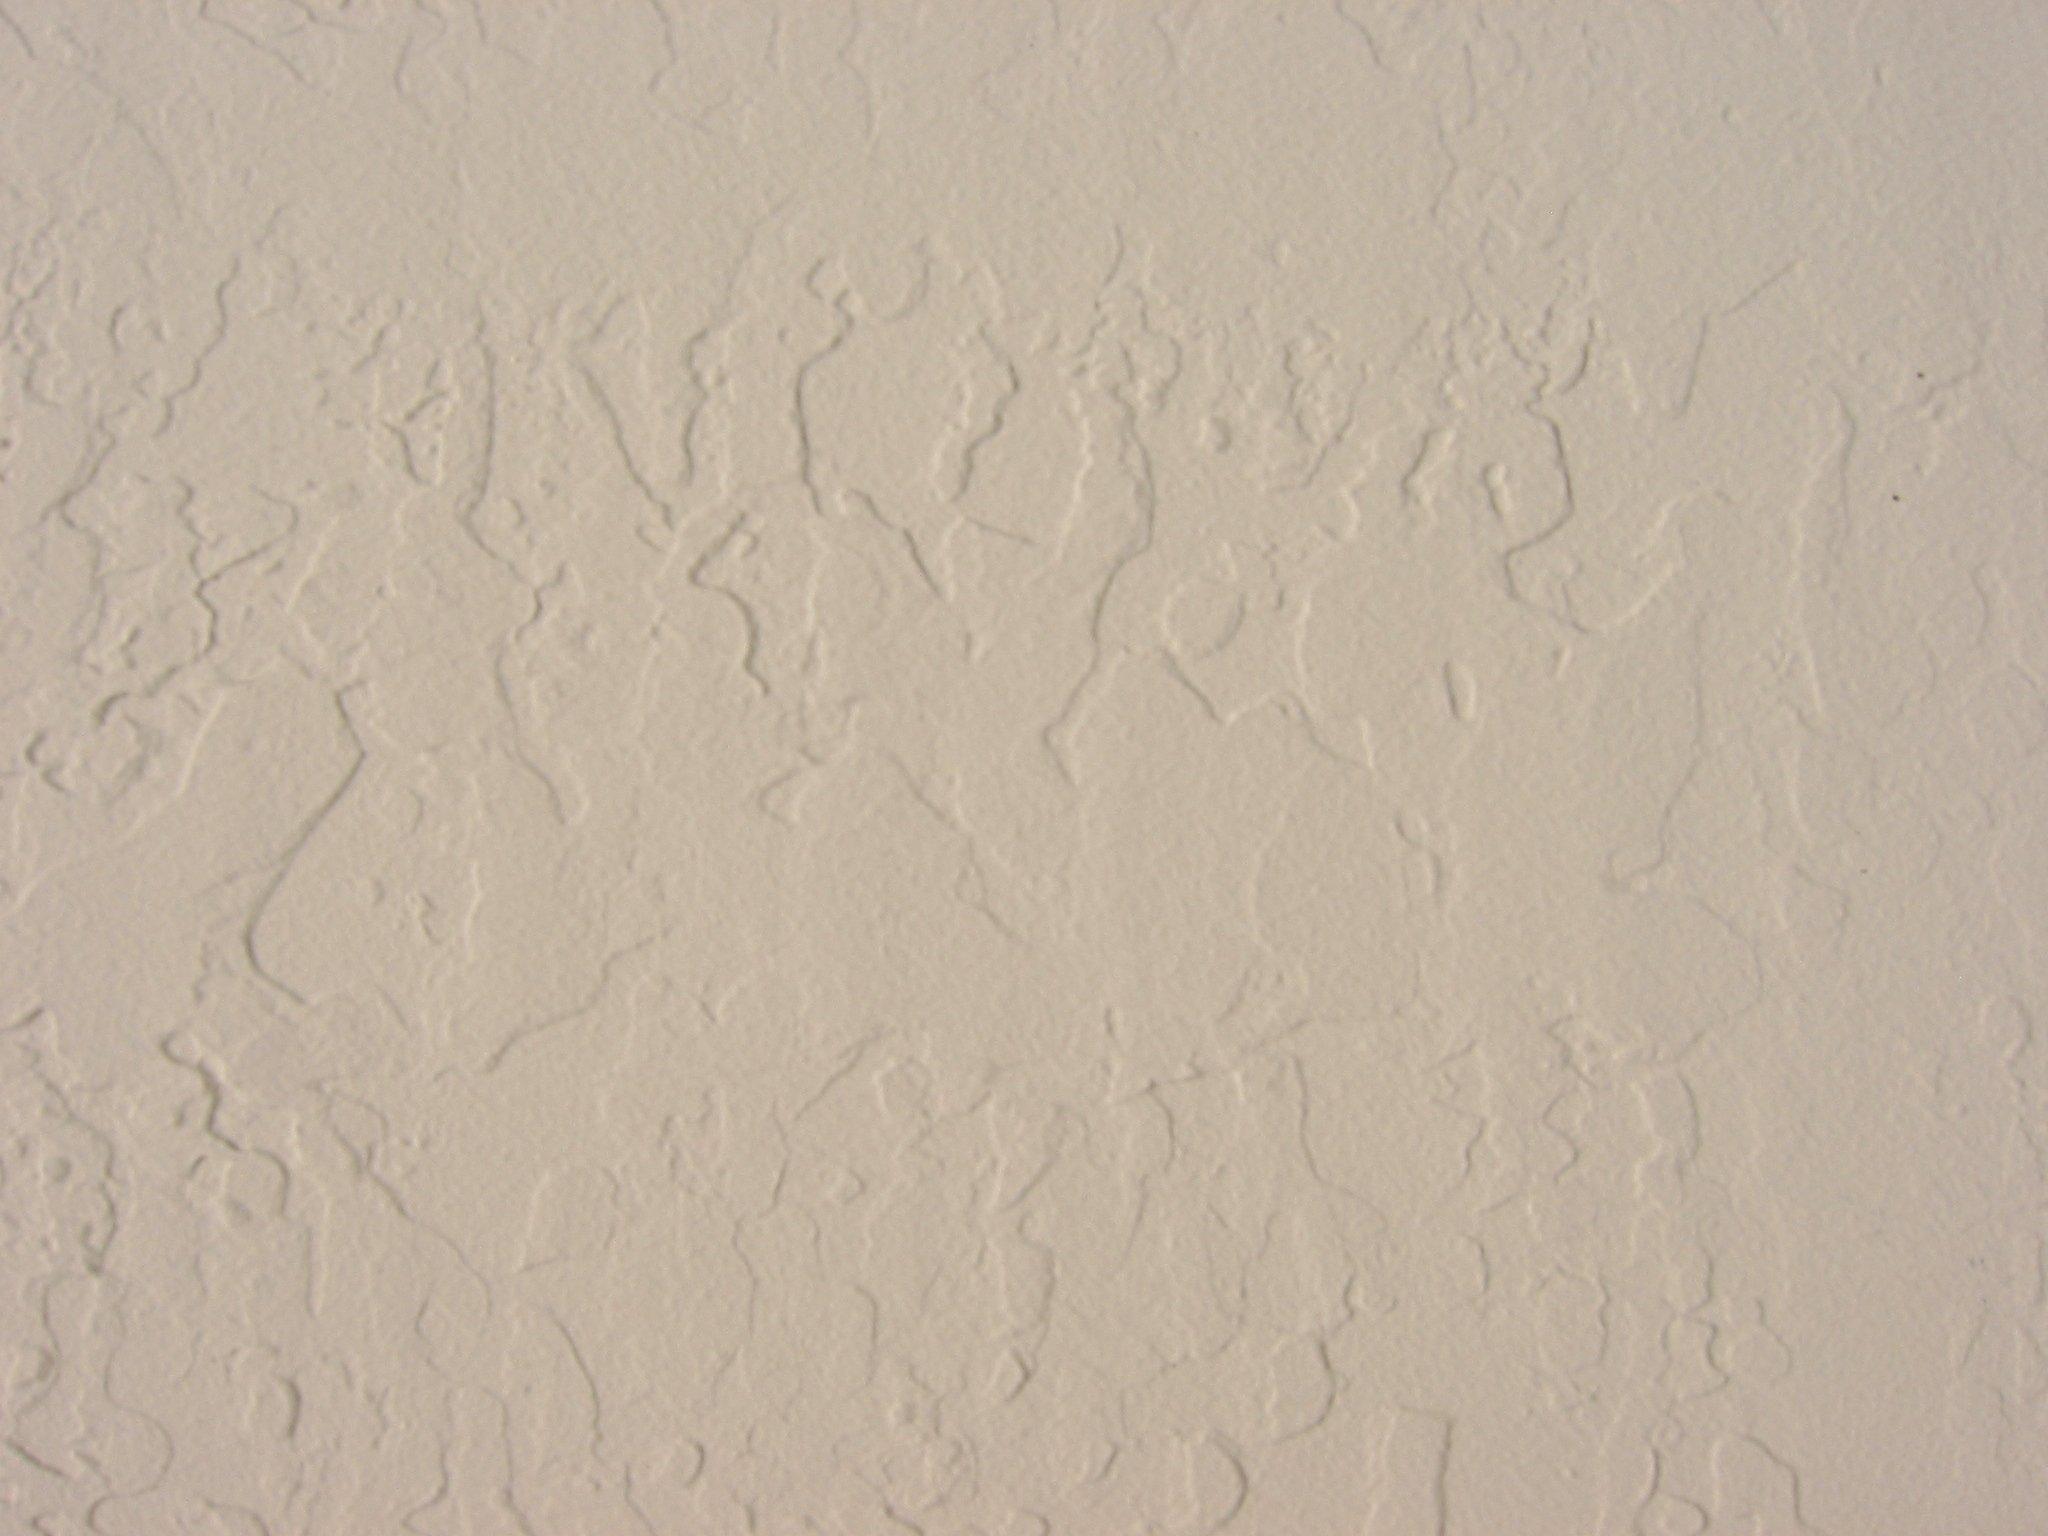 Drywall Texture Samples httpwwwnejpasahiamericandrywallpaint 2048x1536